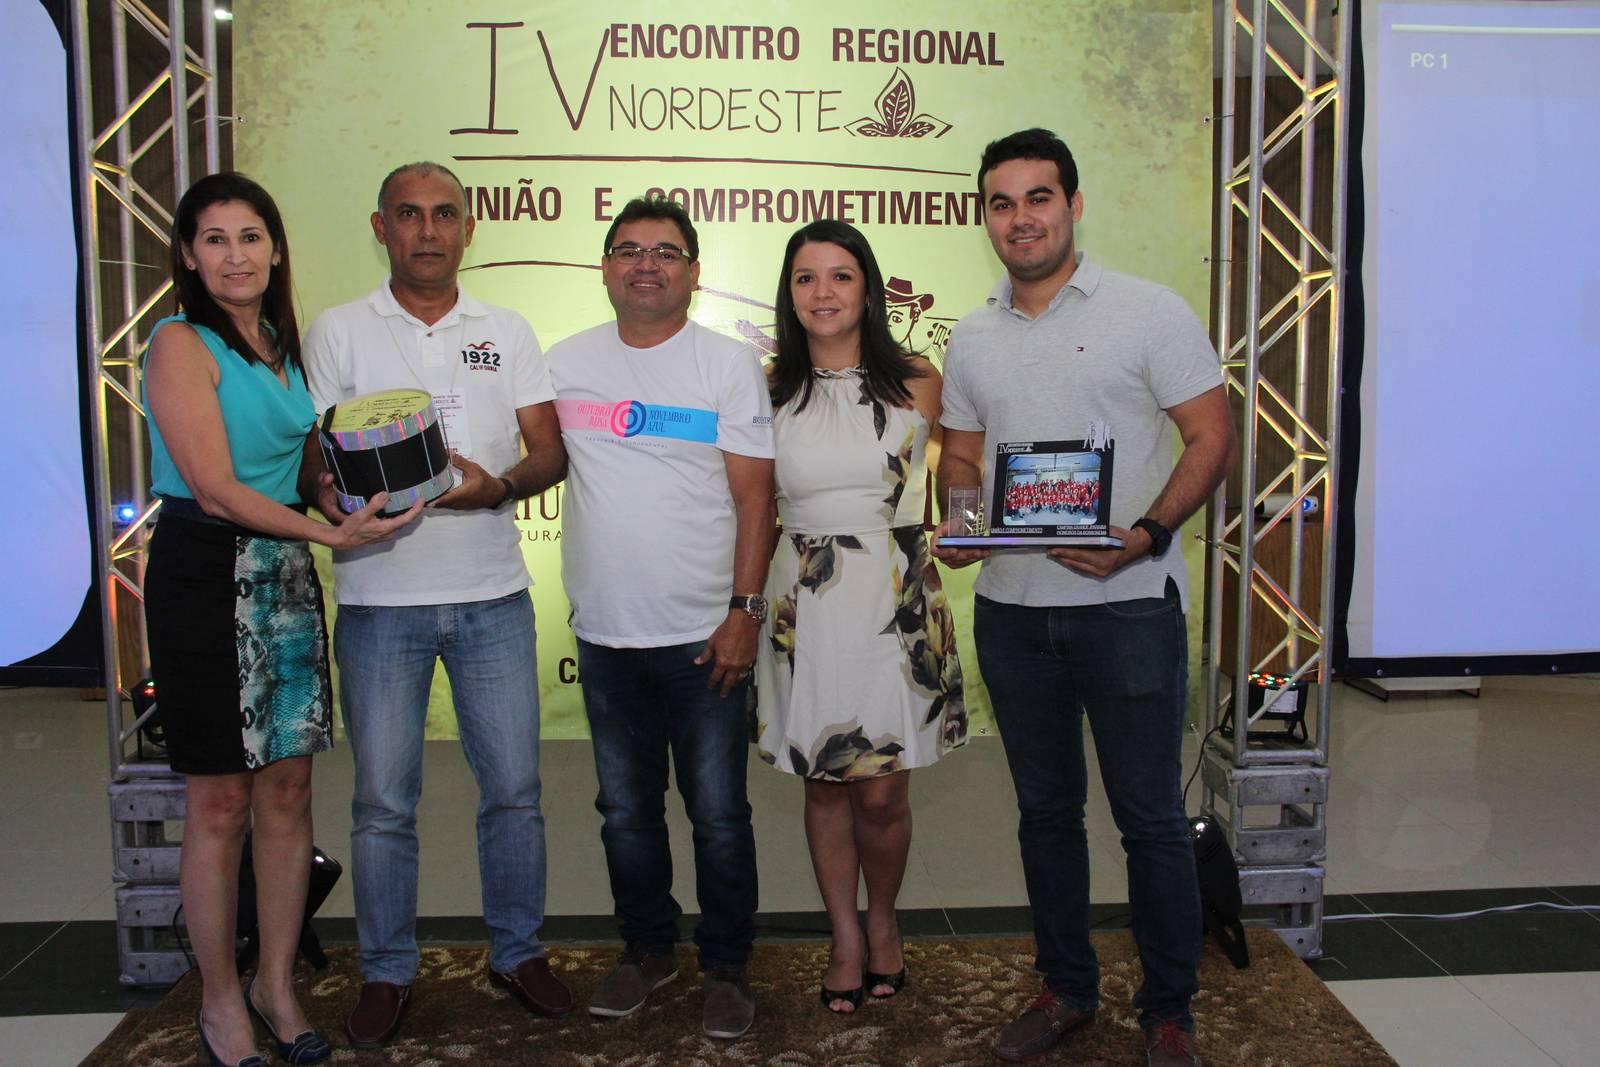 IV Encontro Regional do Nordeste - Bio Extratus (303)